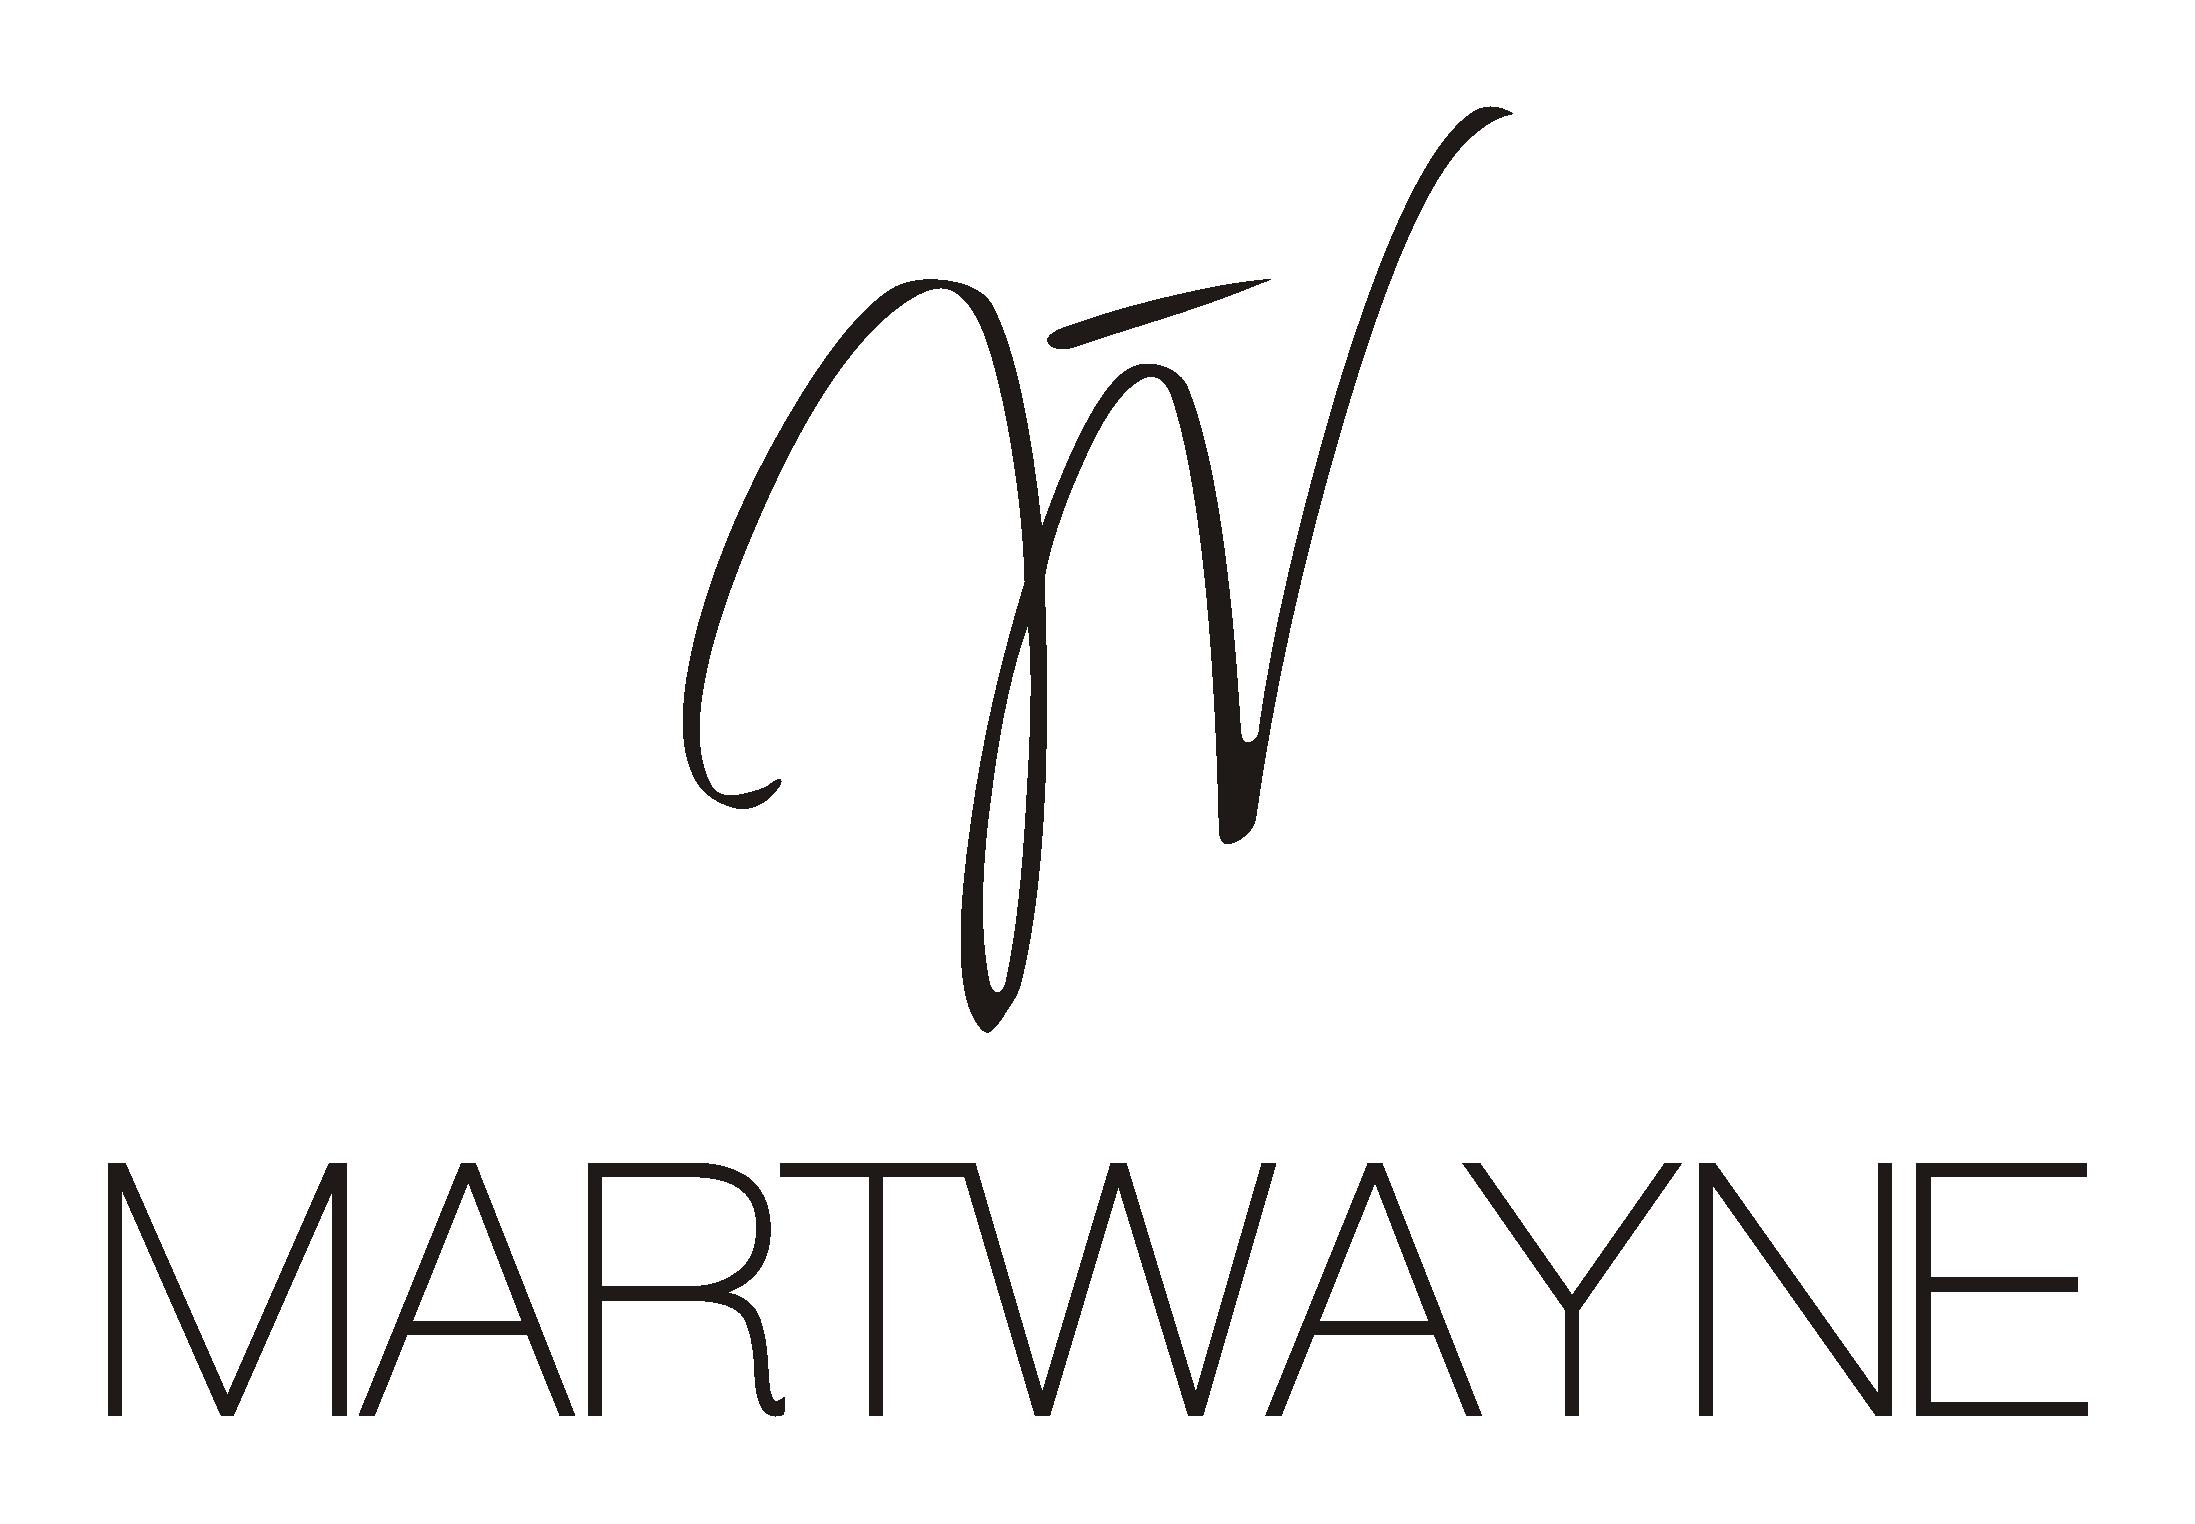 Martwayne